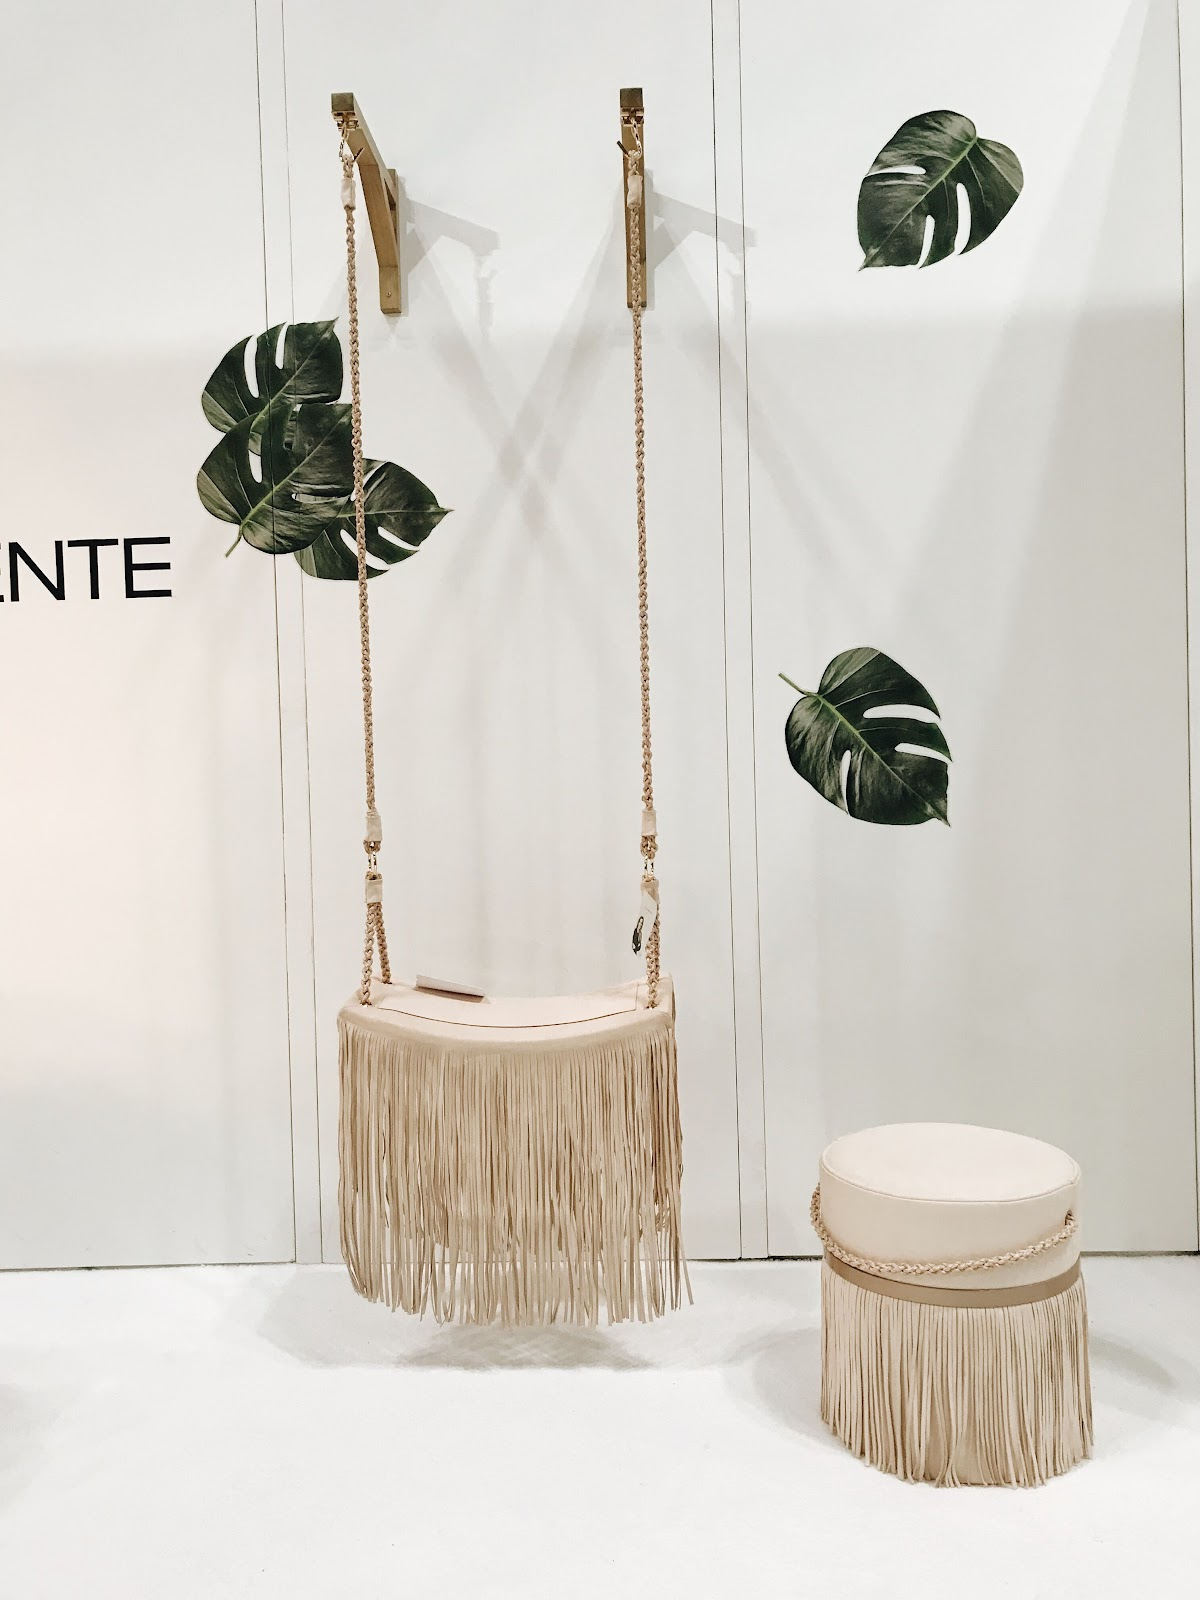 ICFF international contemporary design furniture fair luxury swing indoor